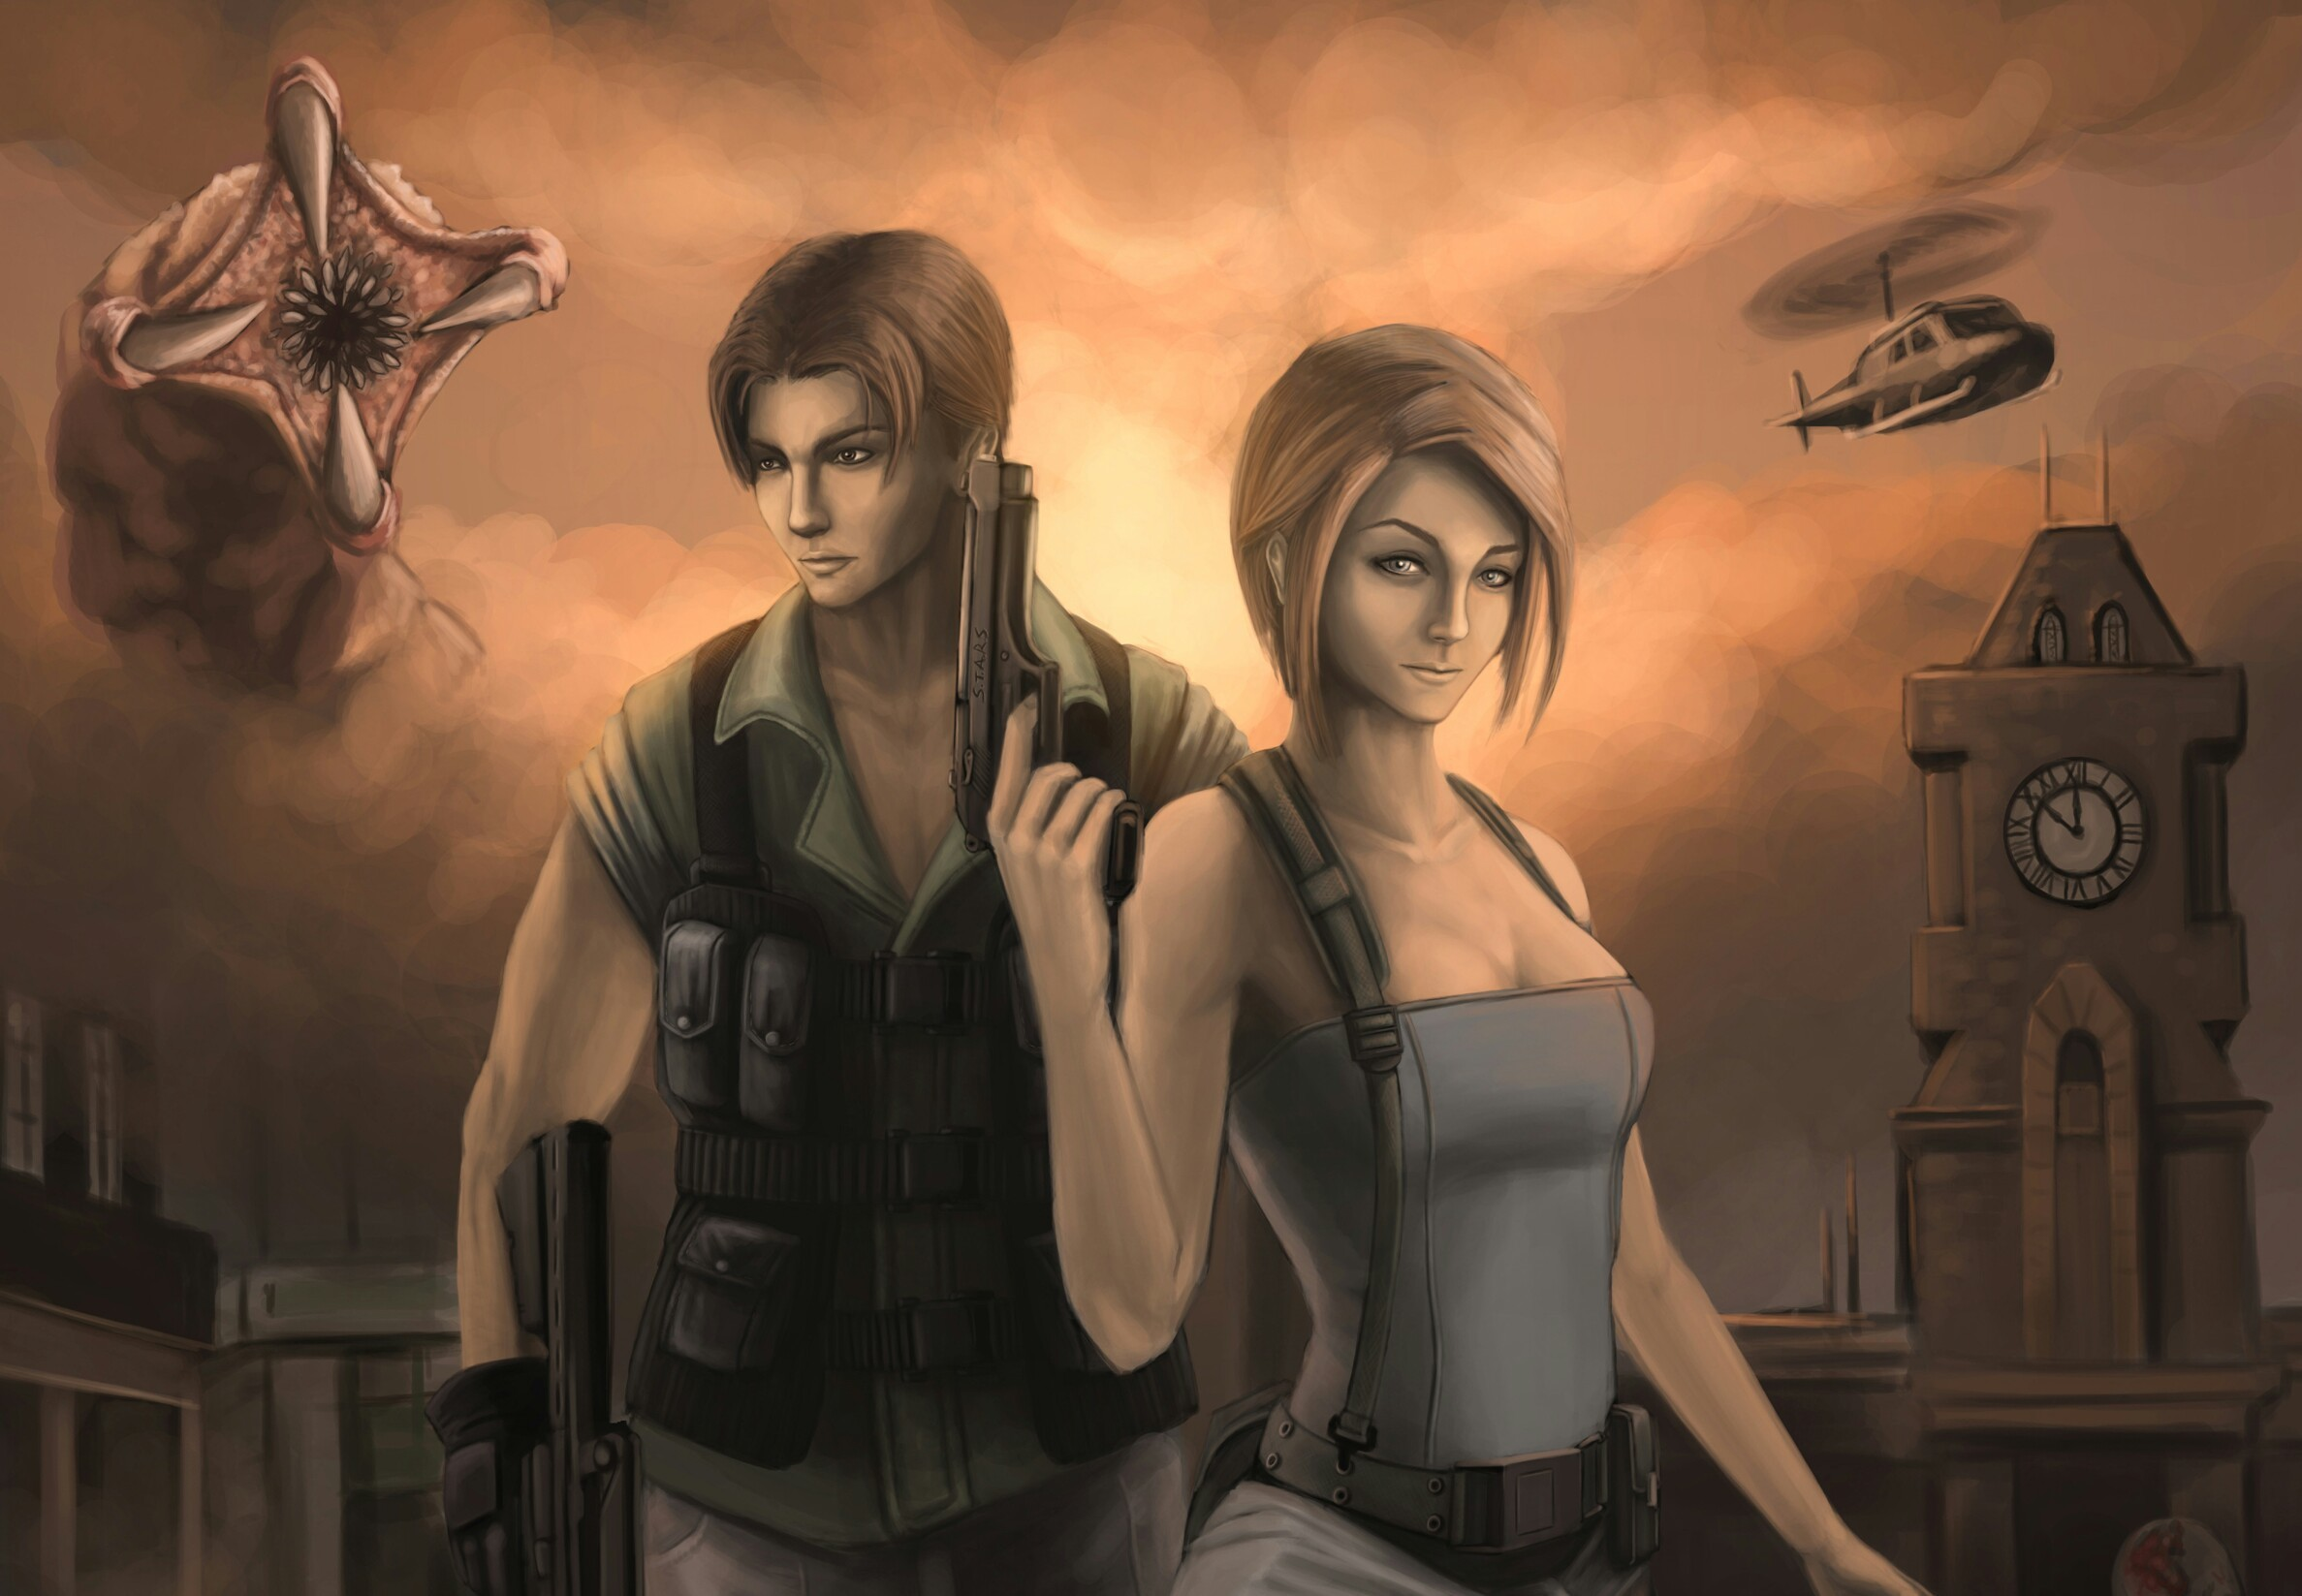 Image Resident Evil 3 jill valentine Carlos Oliveira Girls